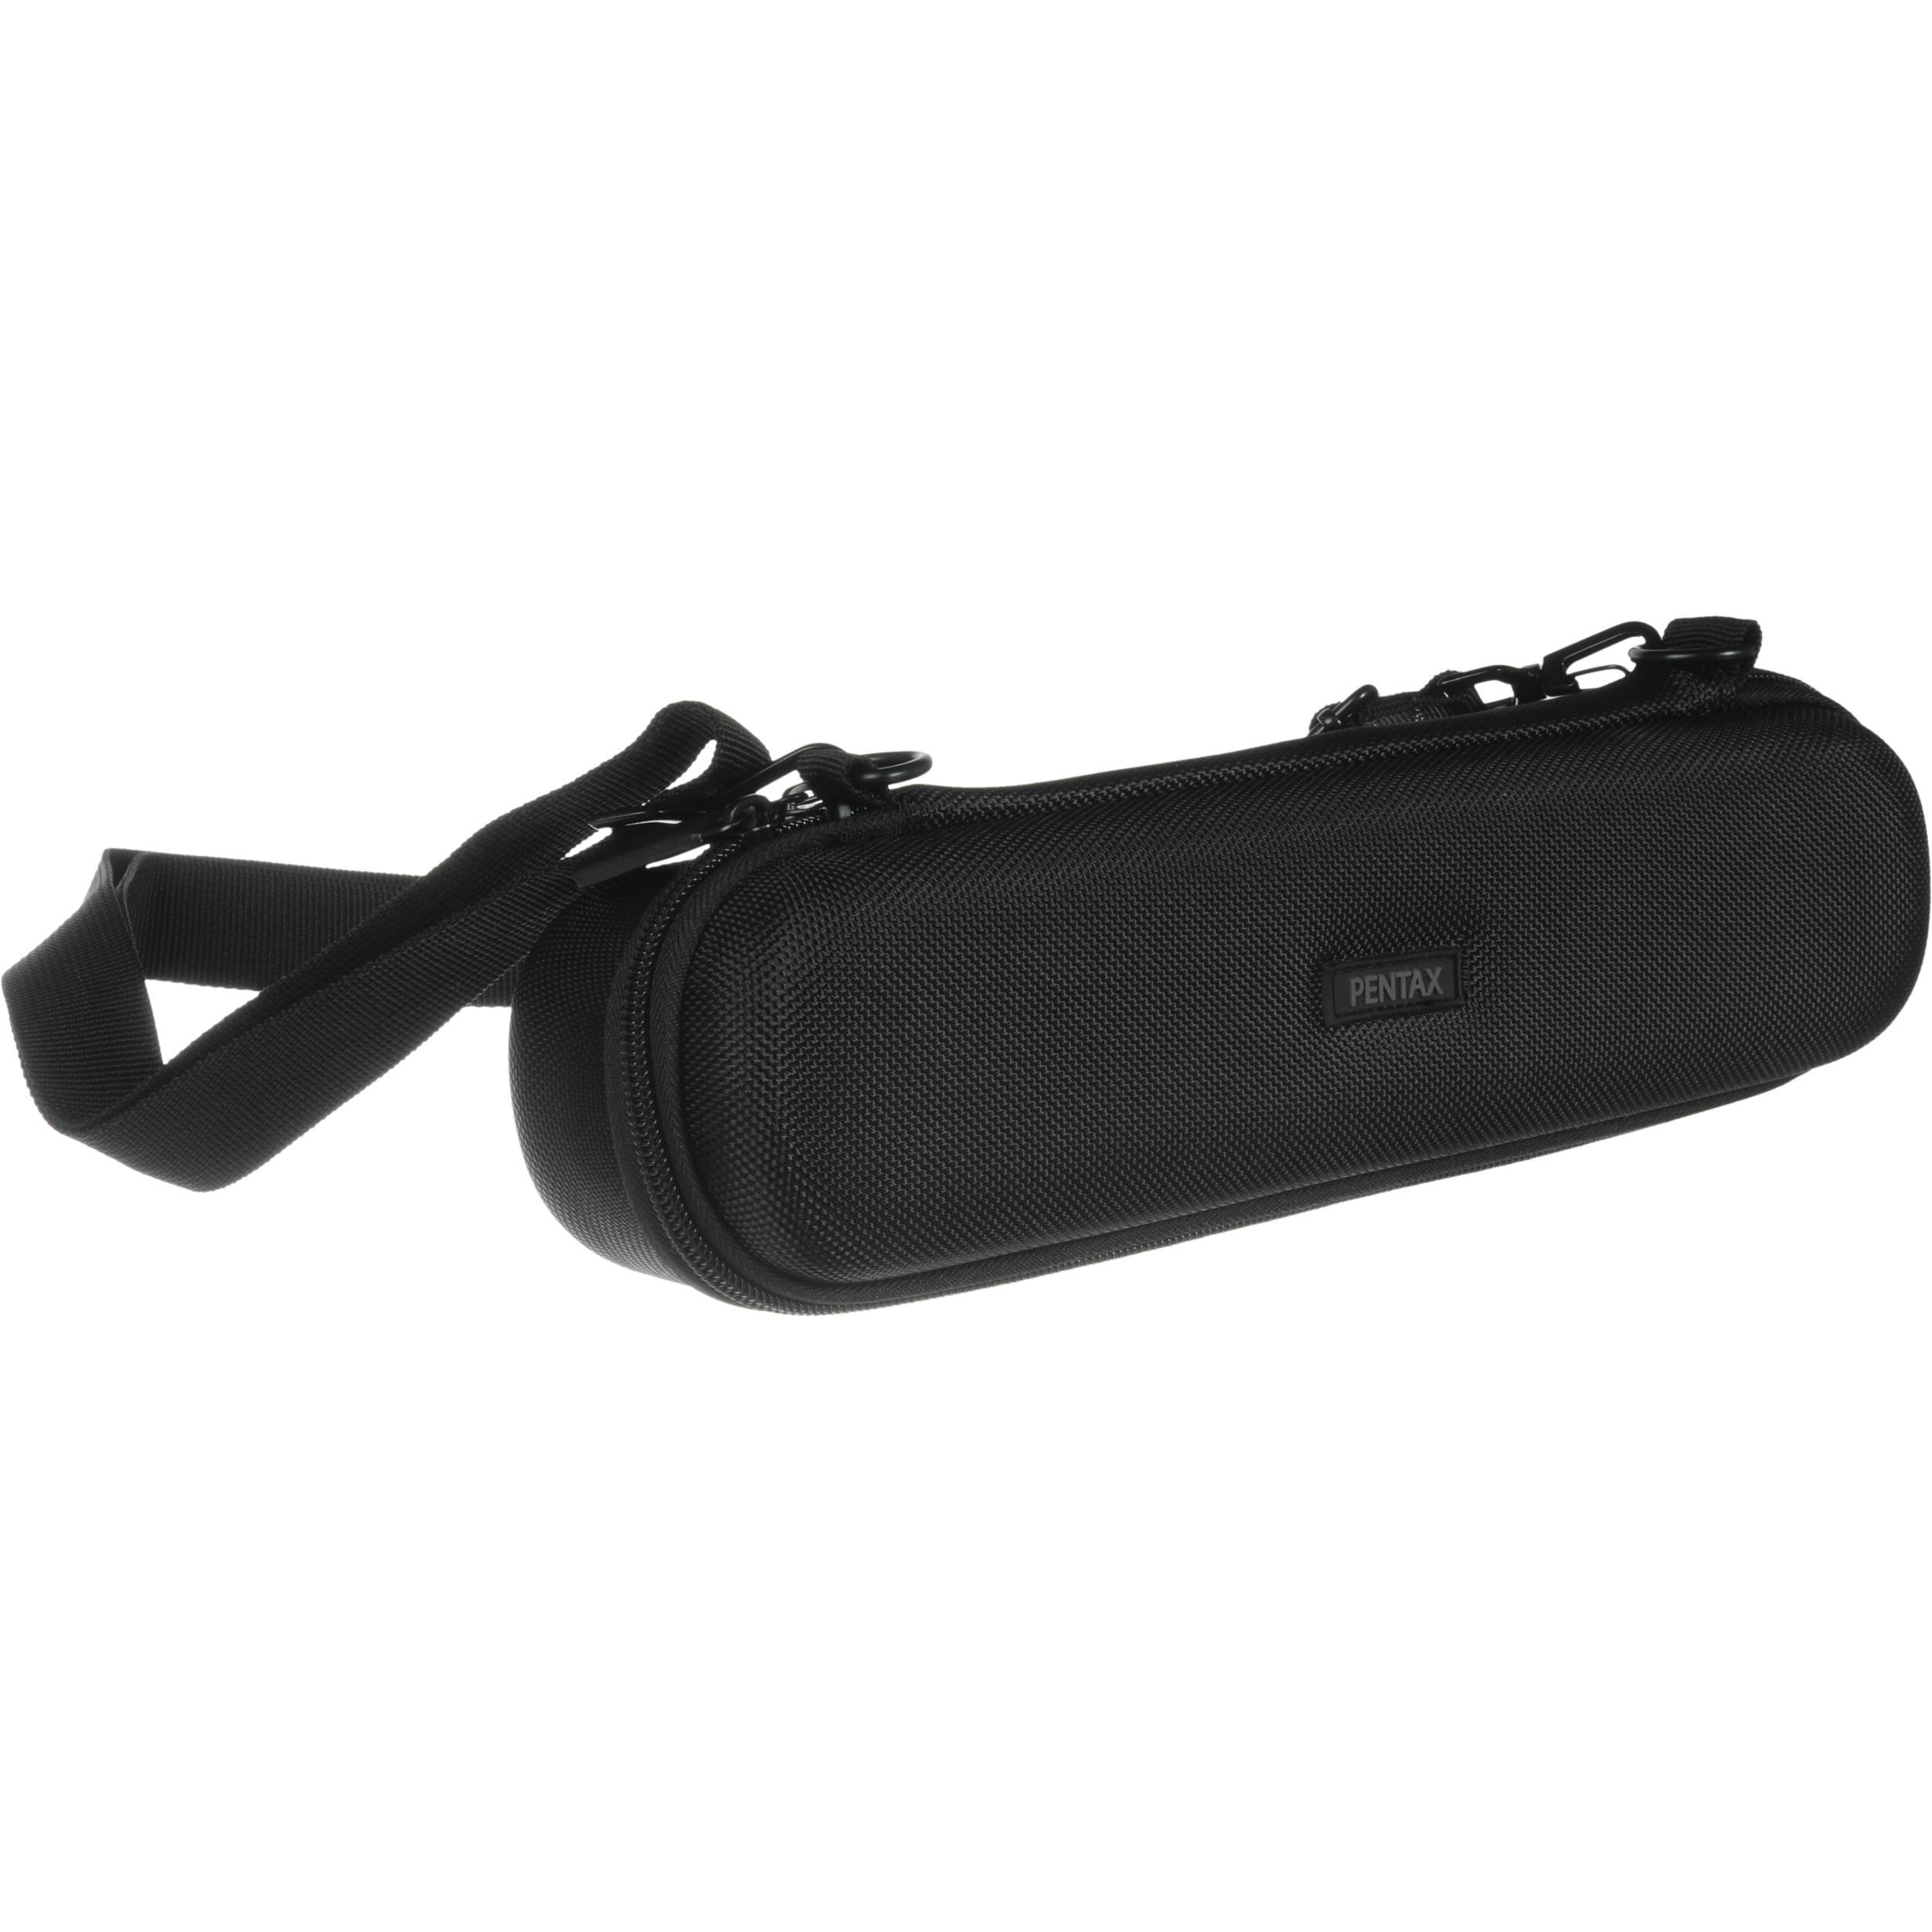 Https C Product 887005 Reg Tetherpro Usb To 30 Micro B Cable Cuc3315 46 Pentax 85230 Da Limited Lens Case 888257